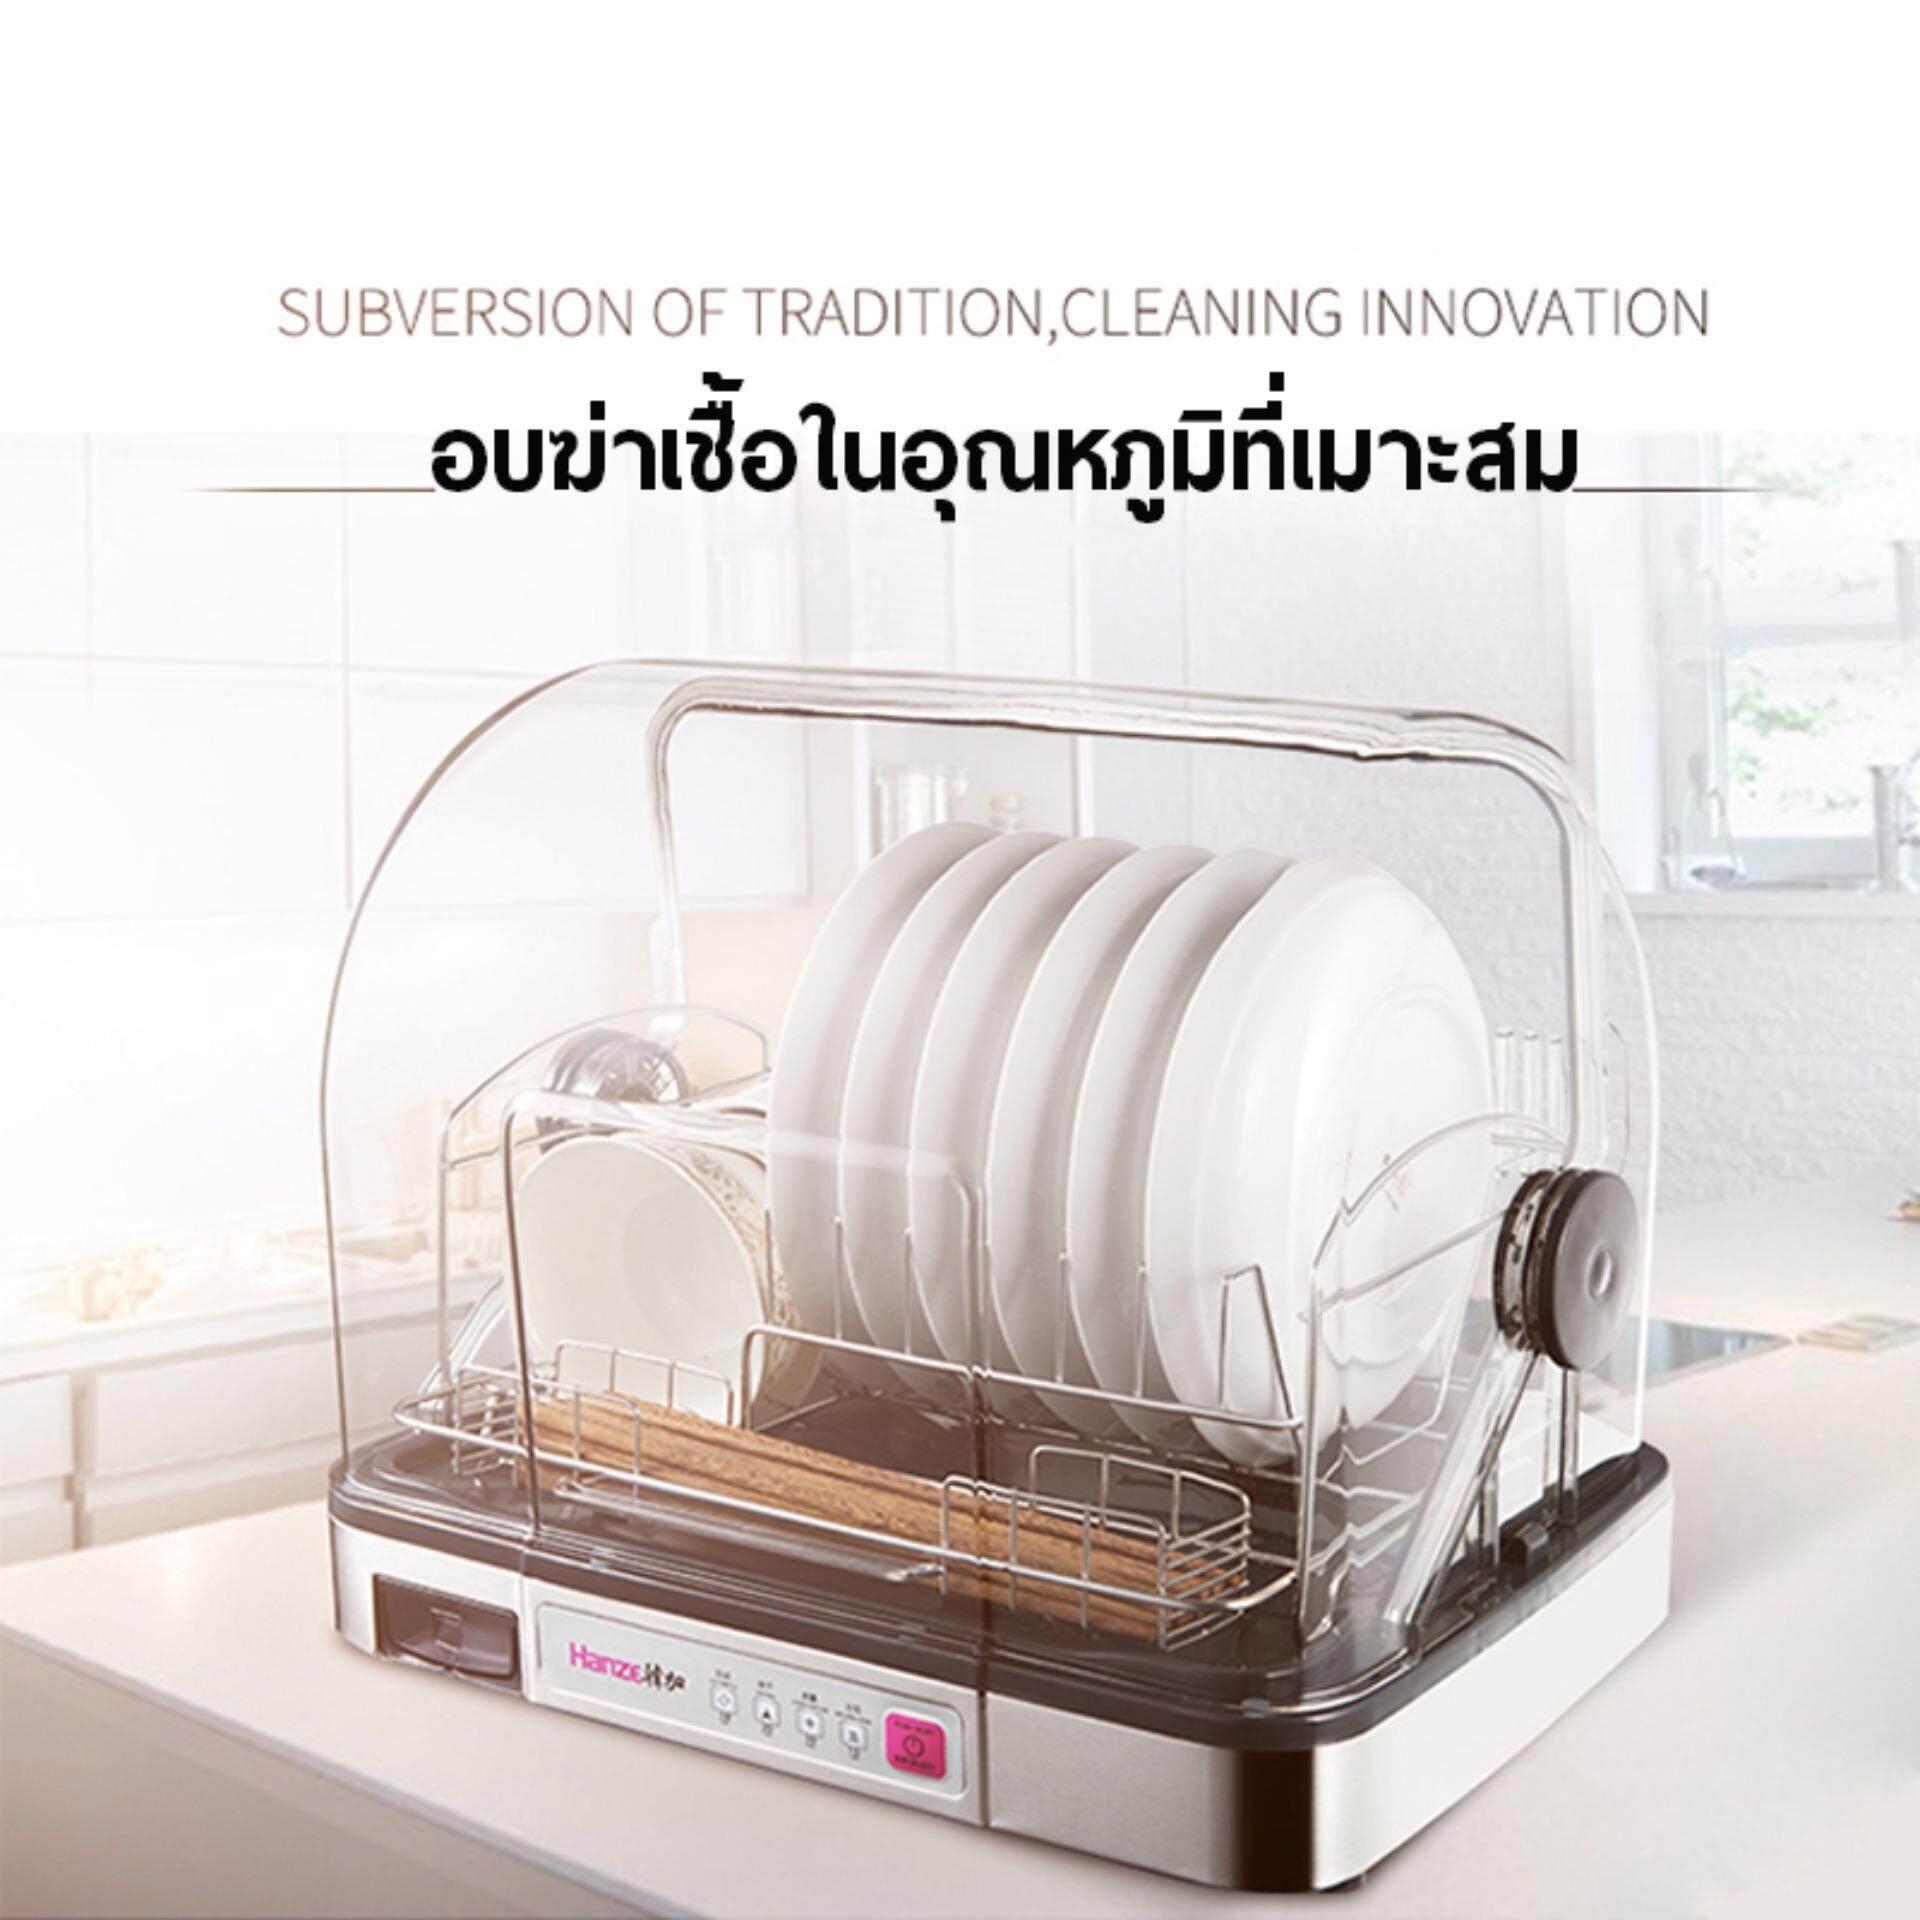 Dishonored เครื่องอบจานฆ่าเชื้อ เอนกประสงค์ Hanze ที่อบจาน เครื่องล้างจาน เครื่องอบขวดนม เครื่องอบแห้ง เครื่องอบไอนํ้า เครื่องอบขนม By Hothit.